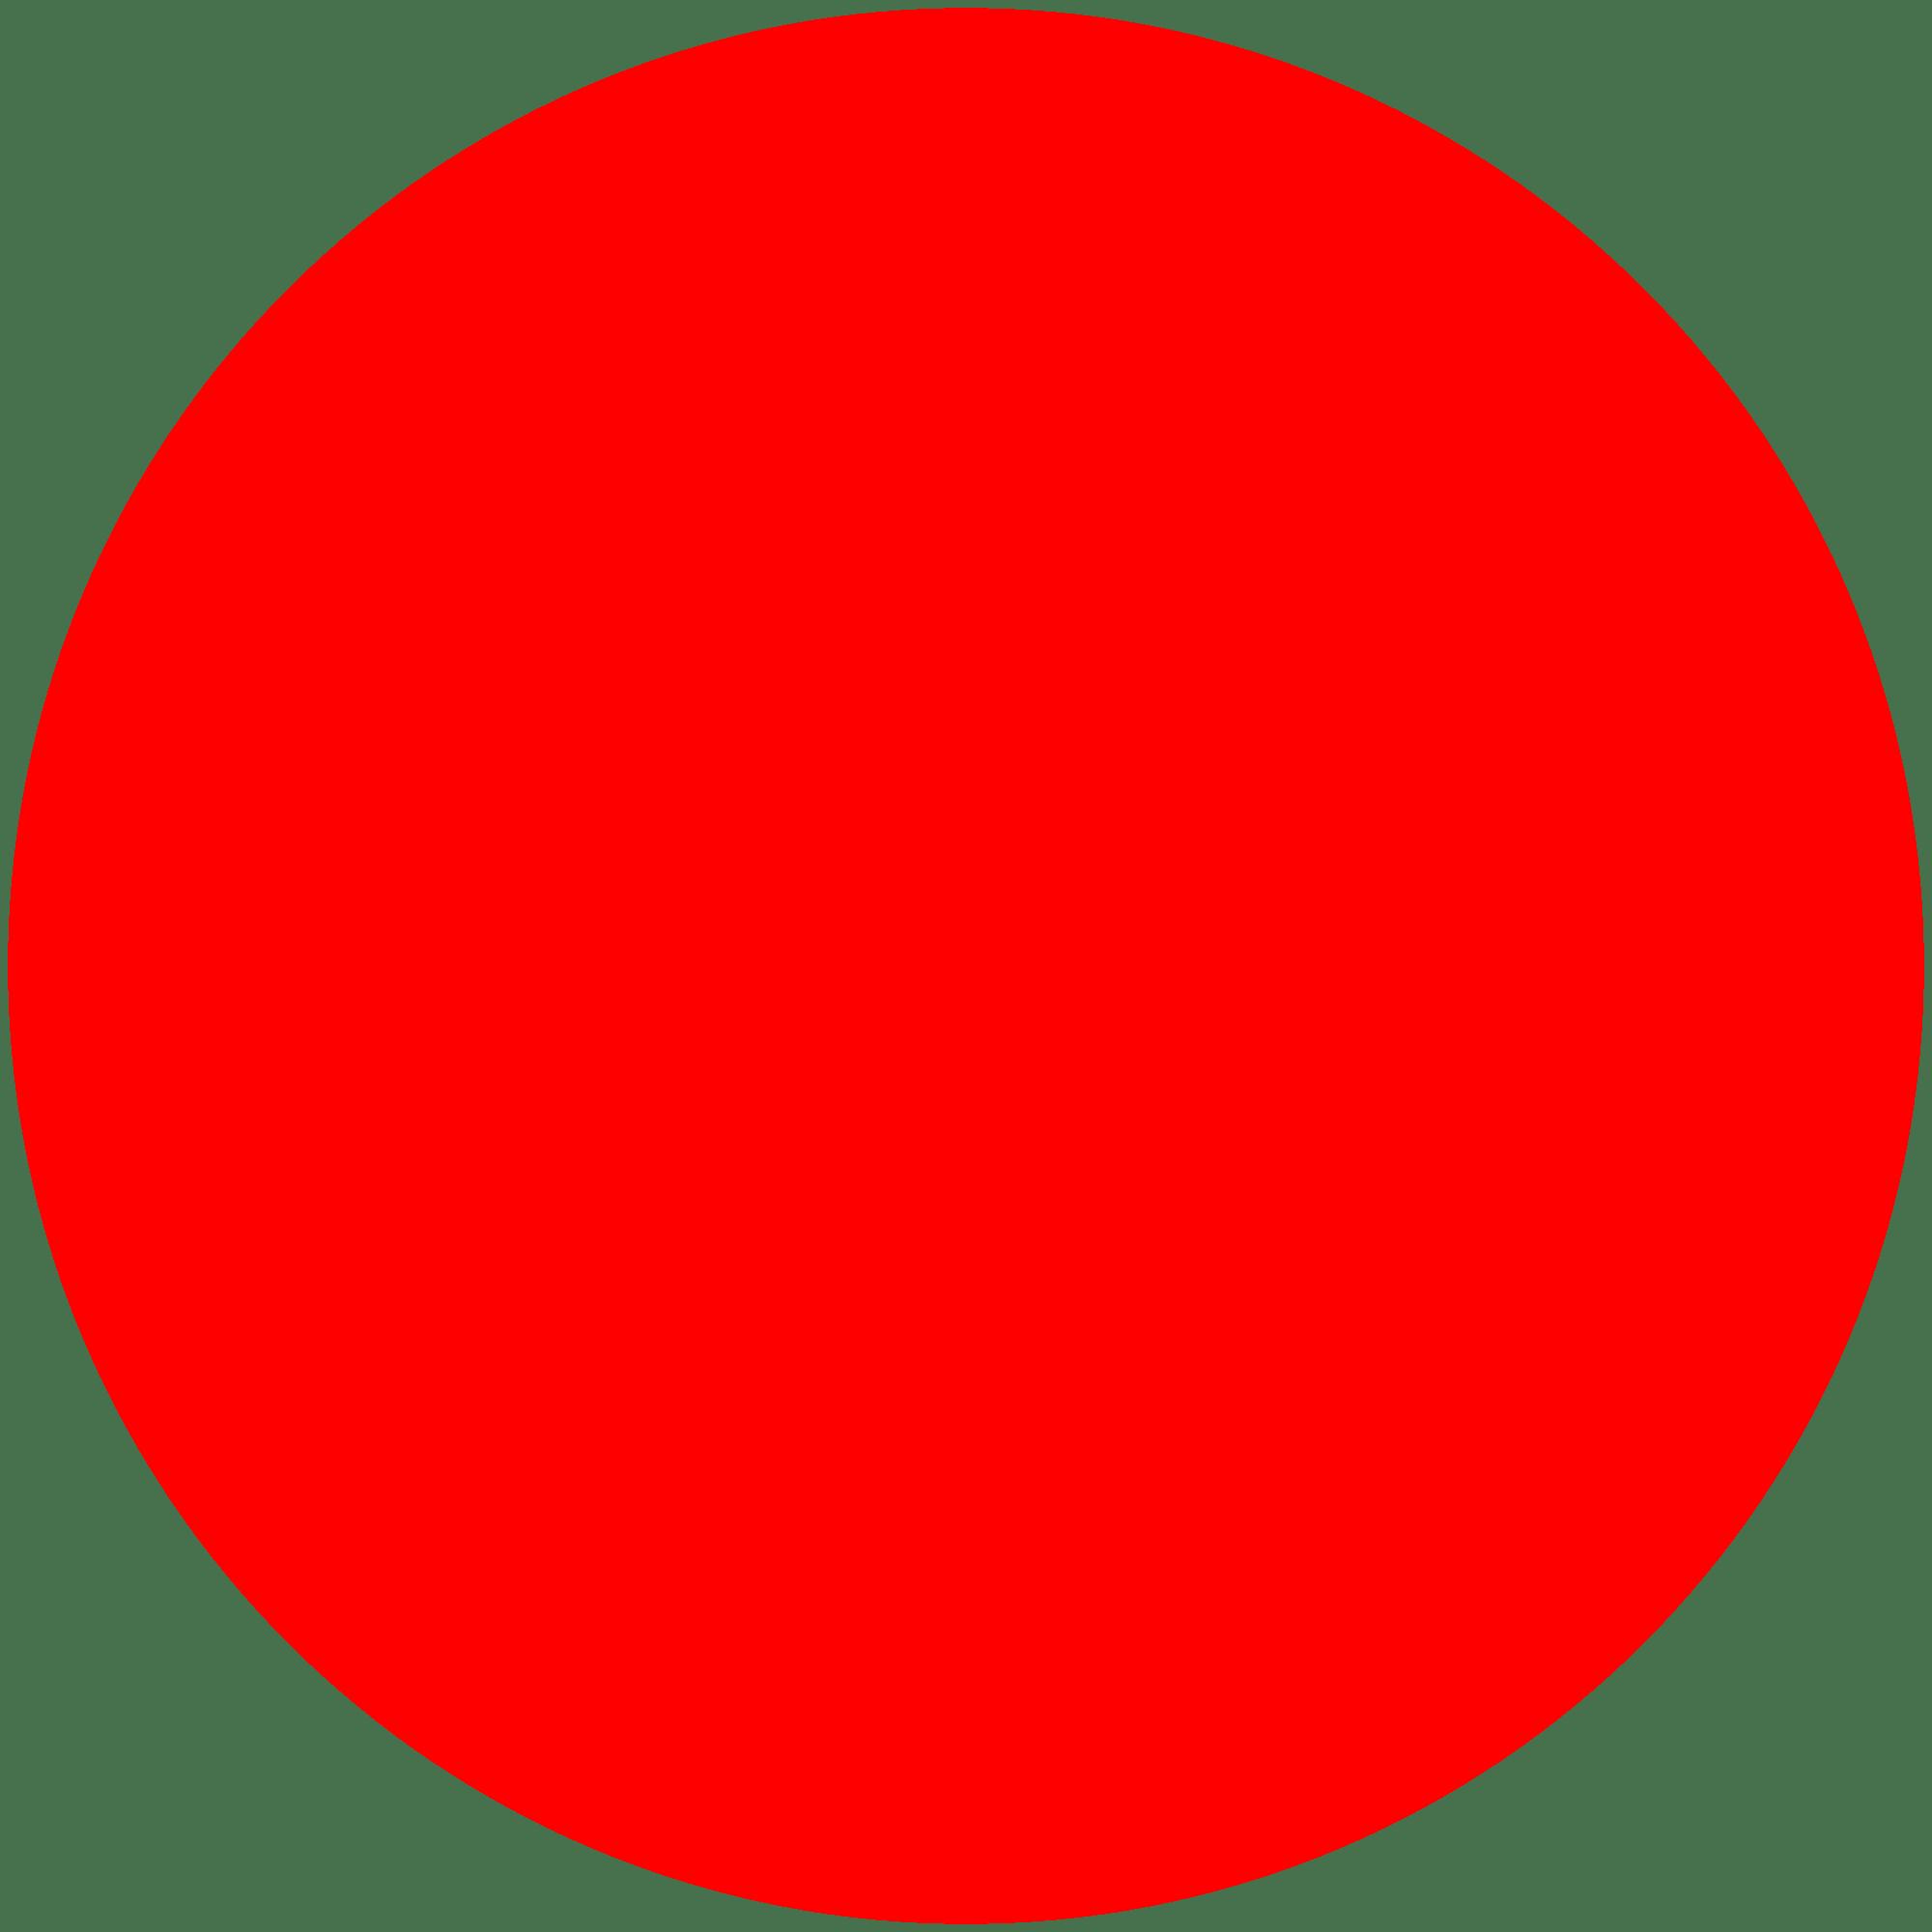 red circle transparent png stickpng